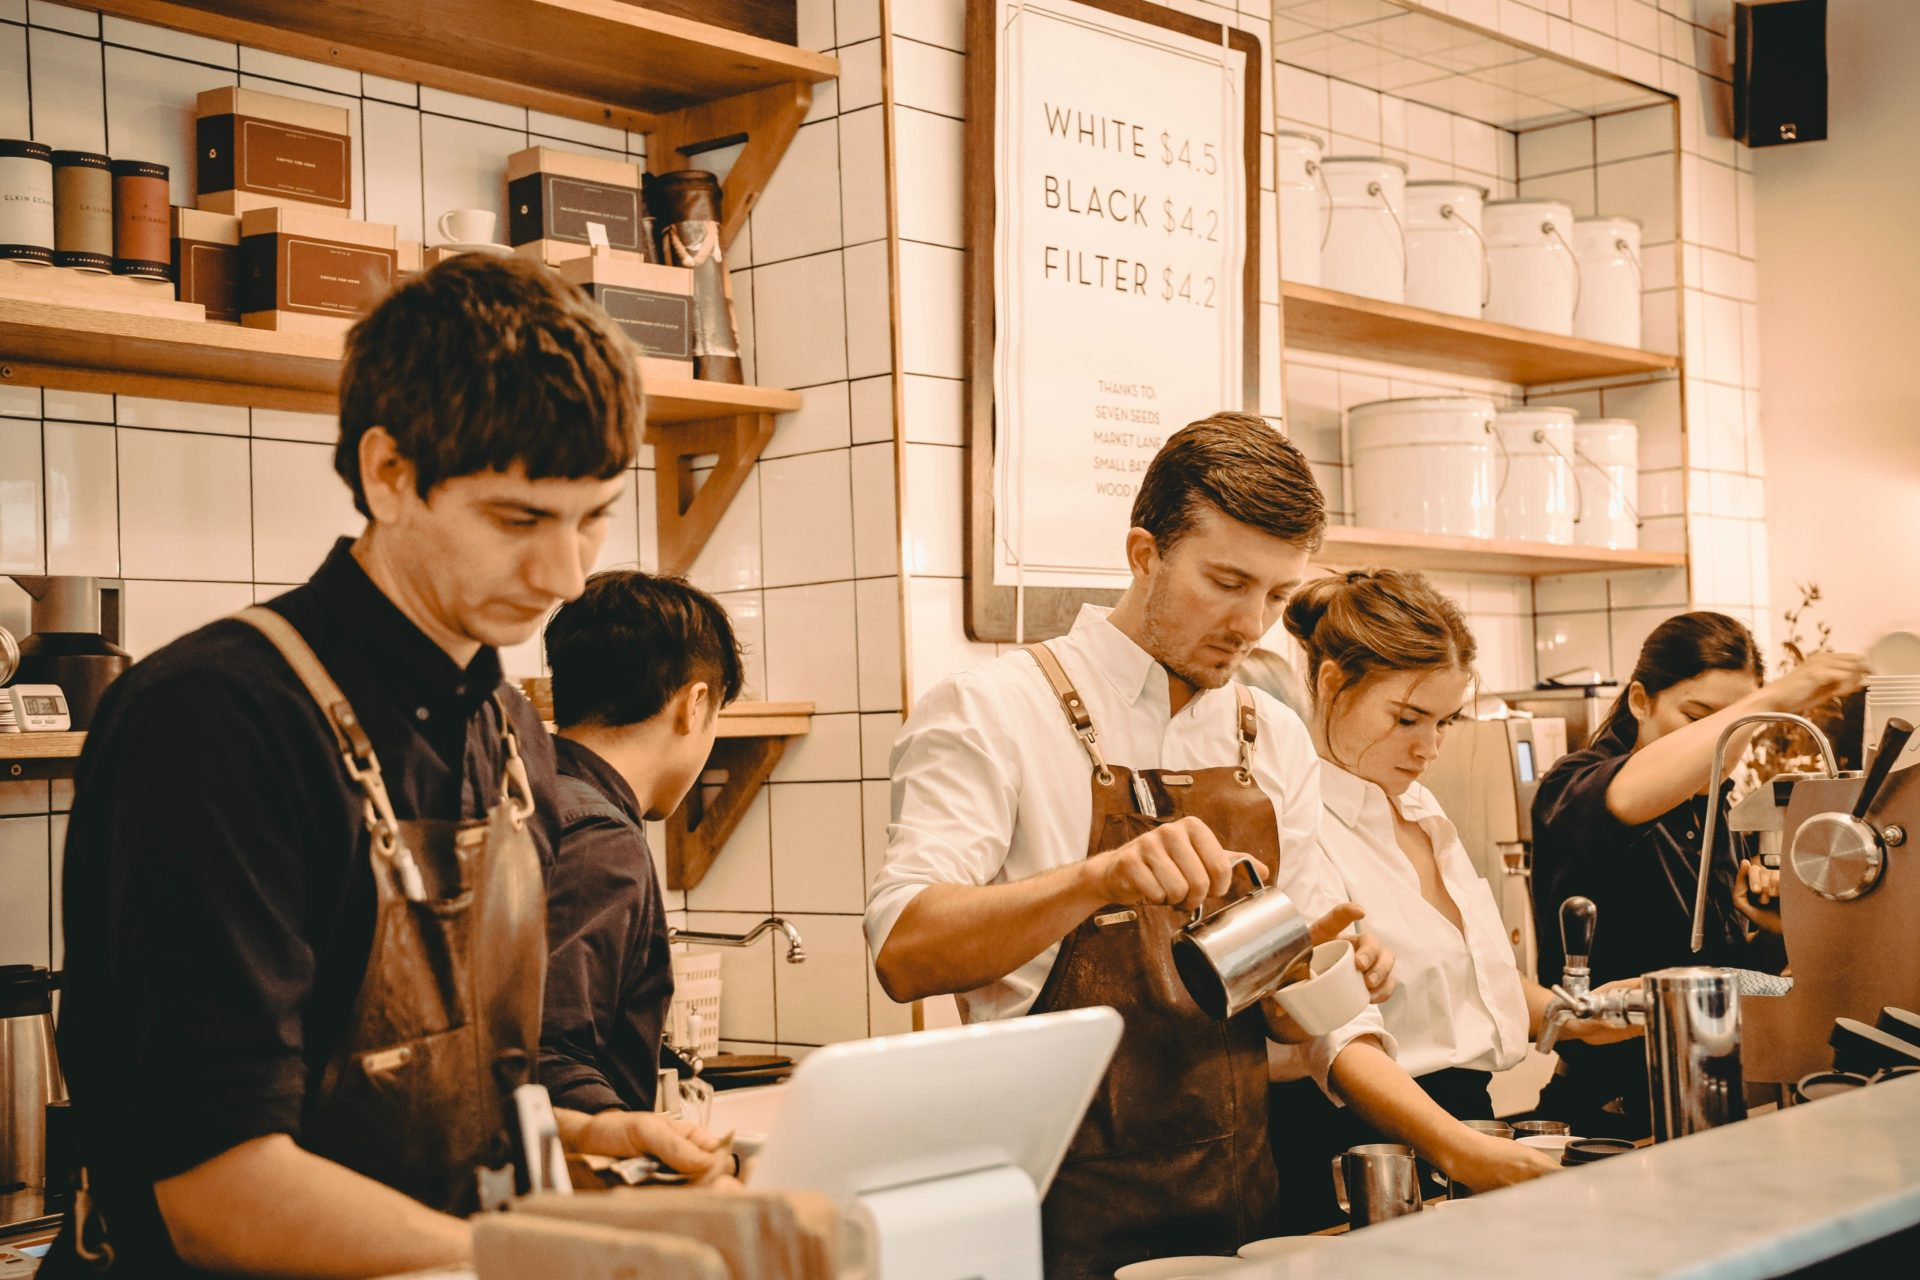 bar staff working